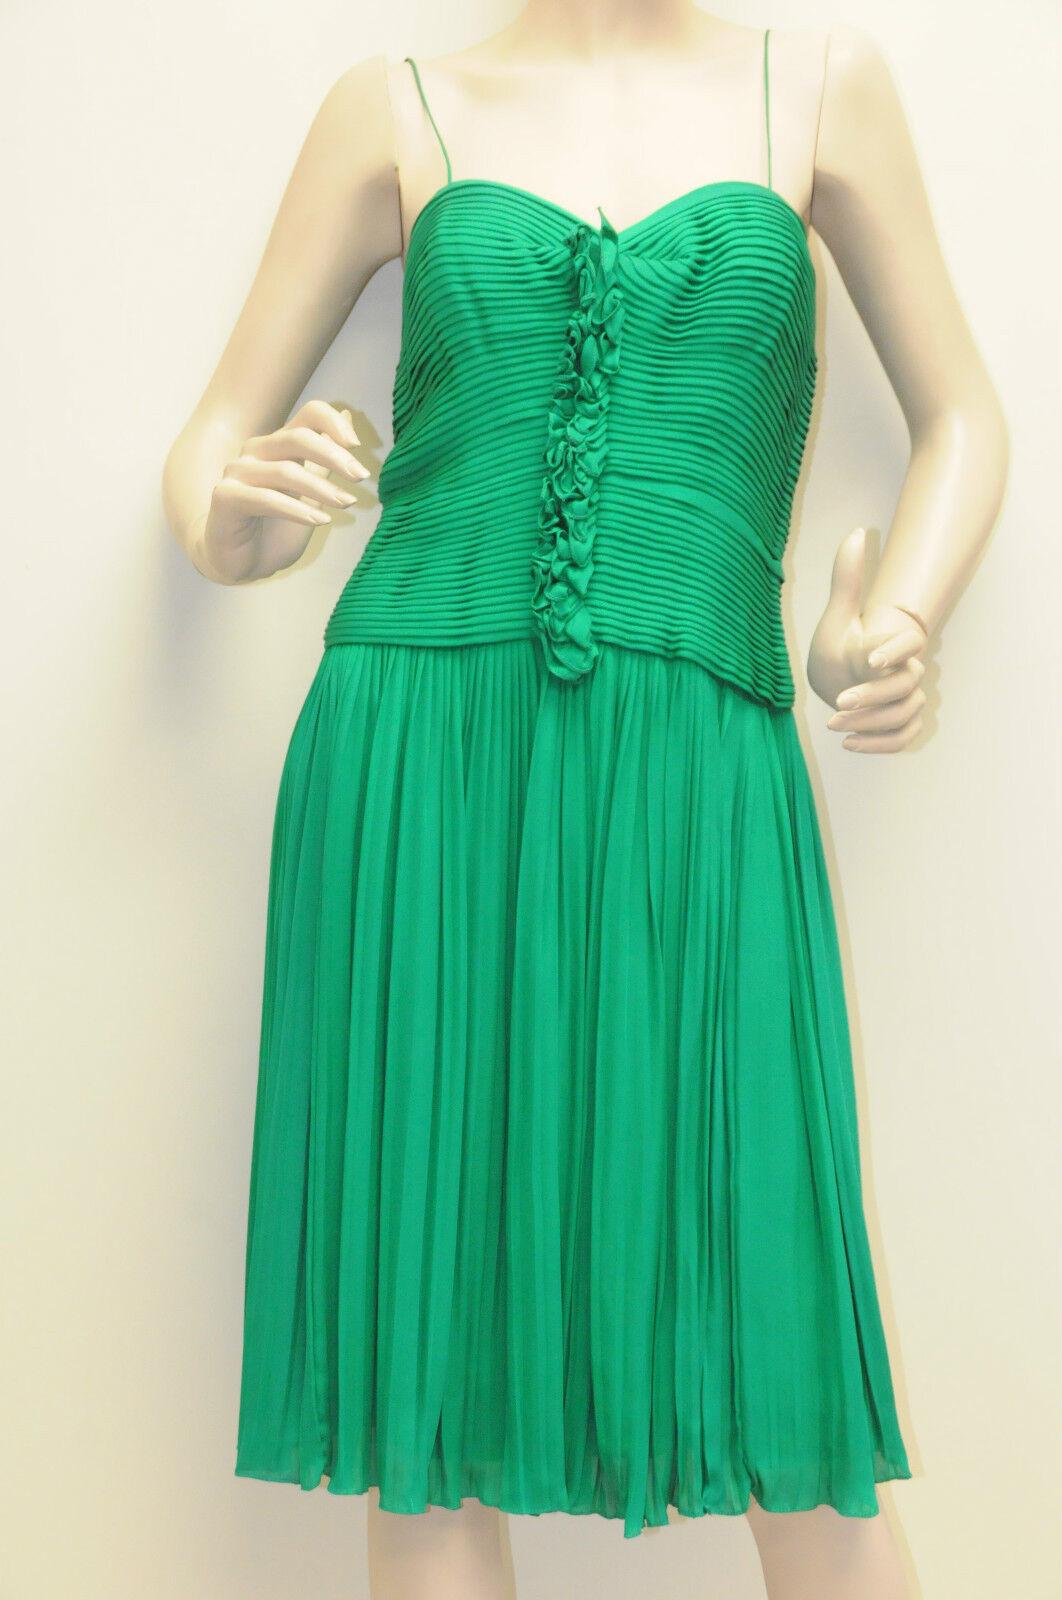 Neu Oscar De La Renta Geo Plissiert Spaghetti Träger Kleid green Kleid 6